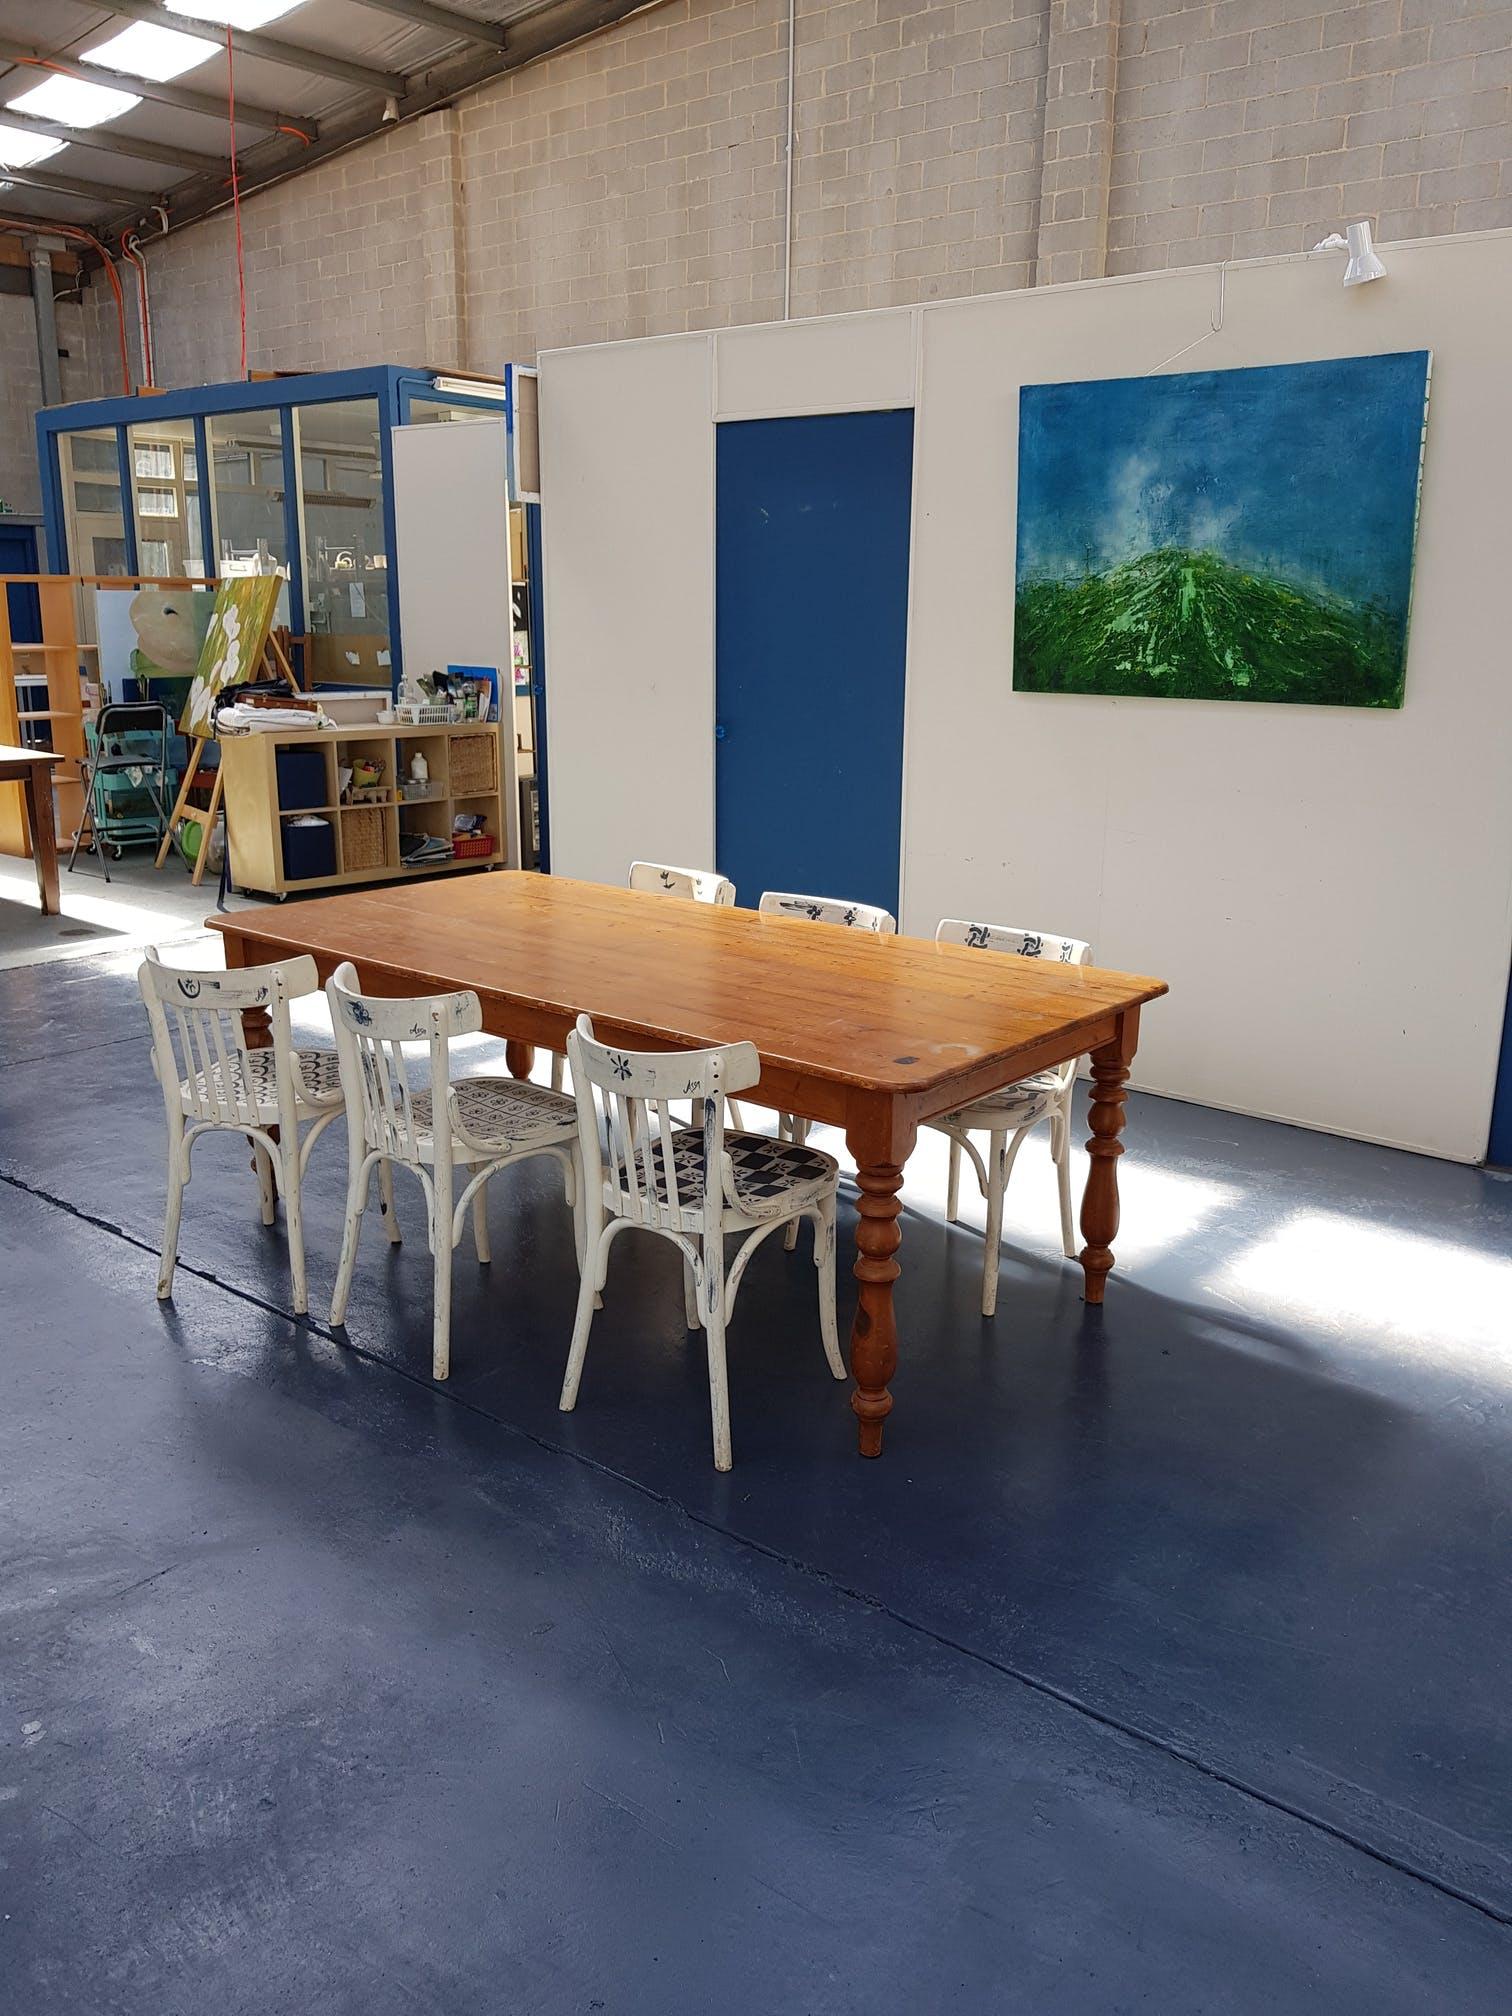 Artists studios for lease, creative studio at Le Studio Art Space & Ceramic Studio, image 1